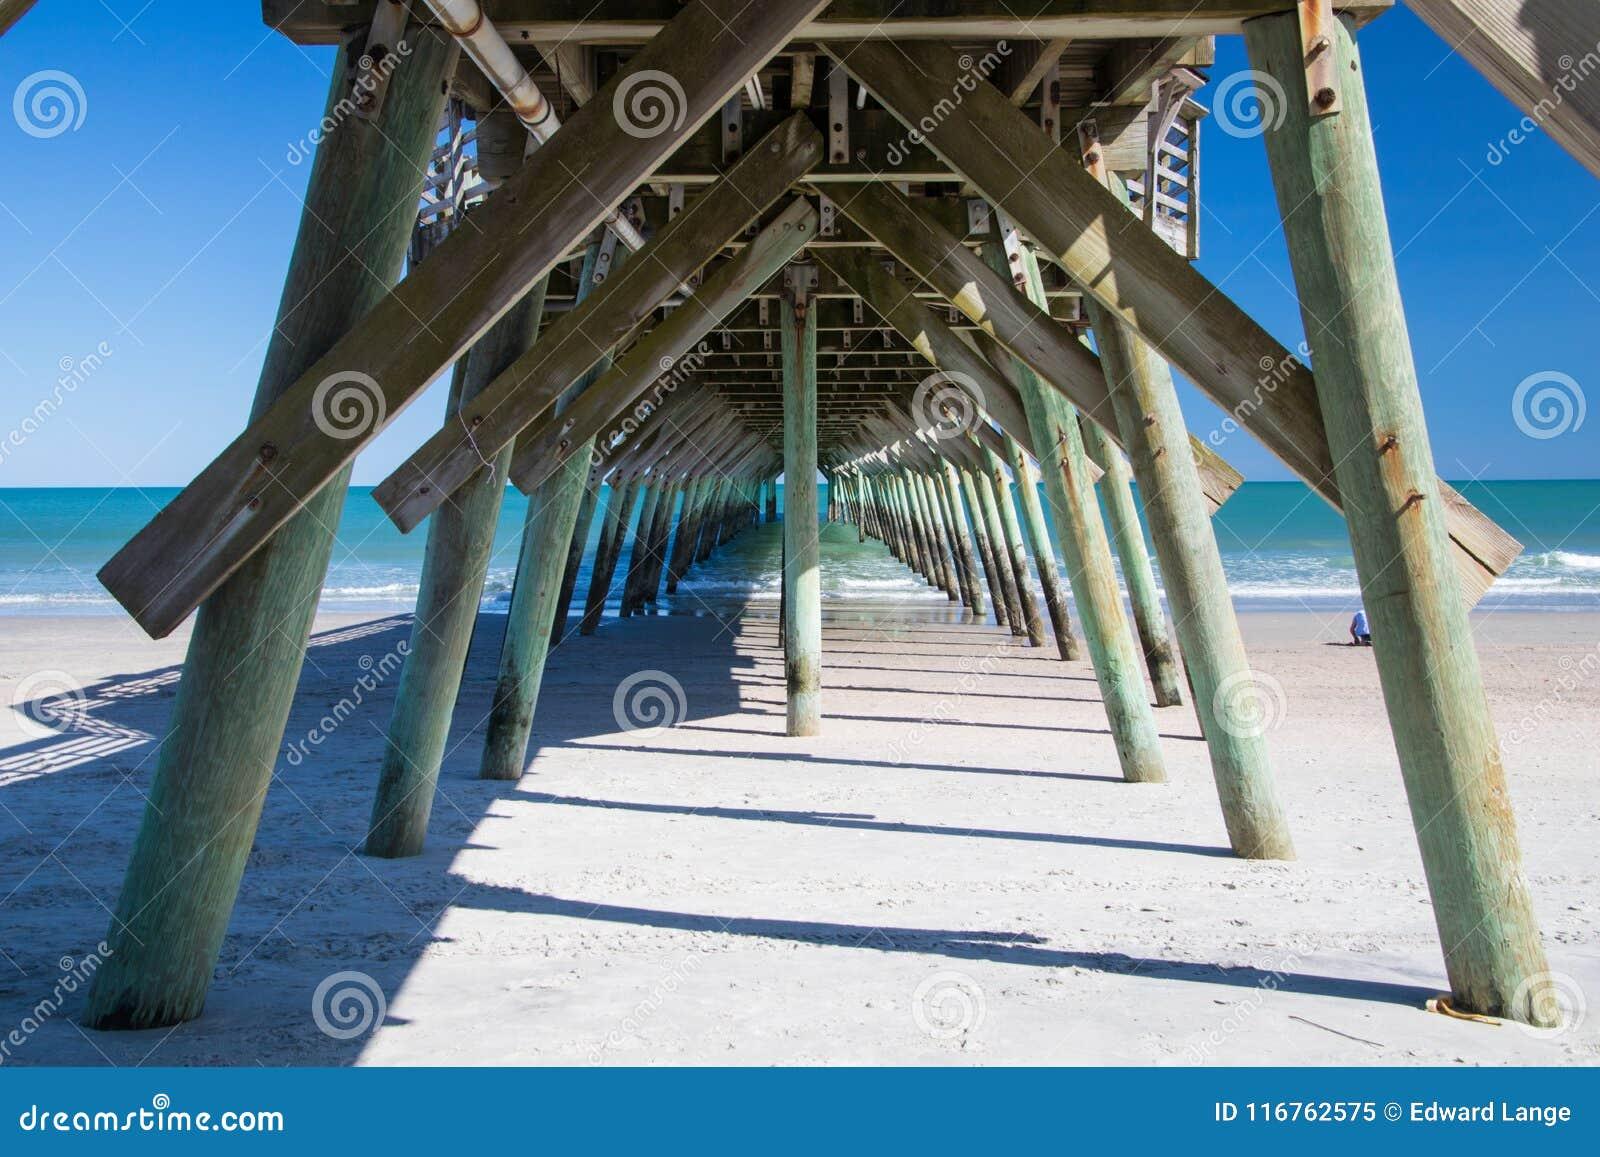 Myrtle Beach, South Carolina State Park Fishing Pier Stock ...